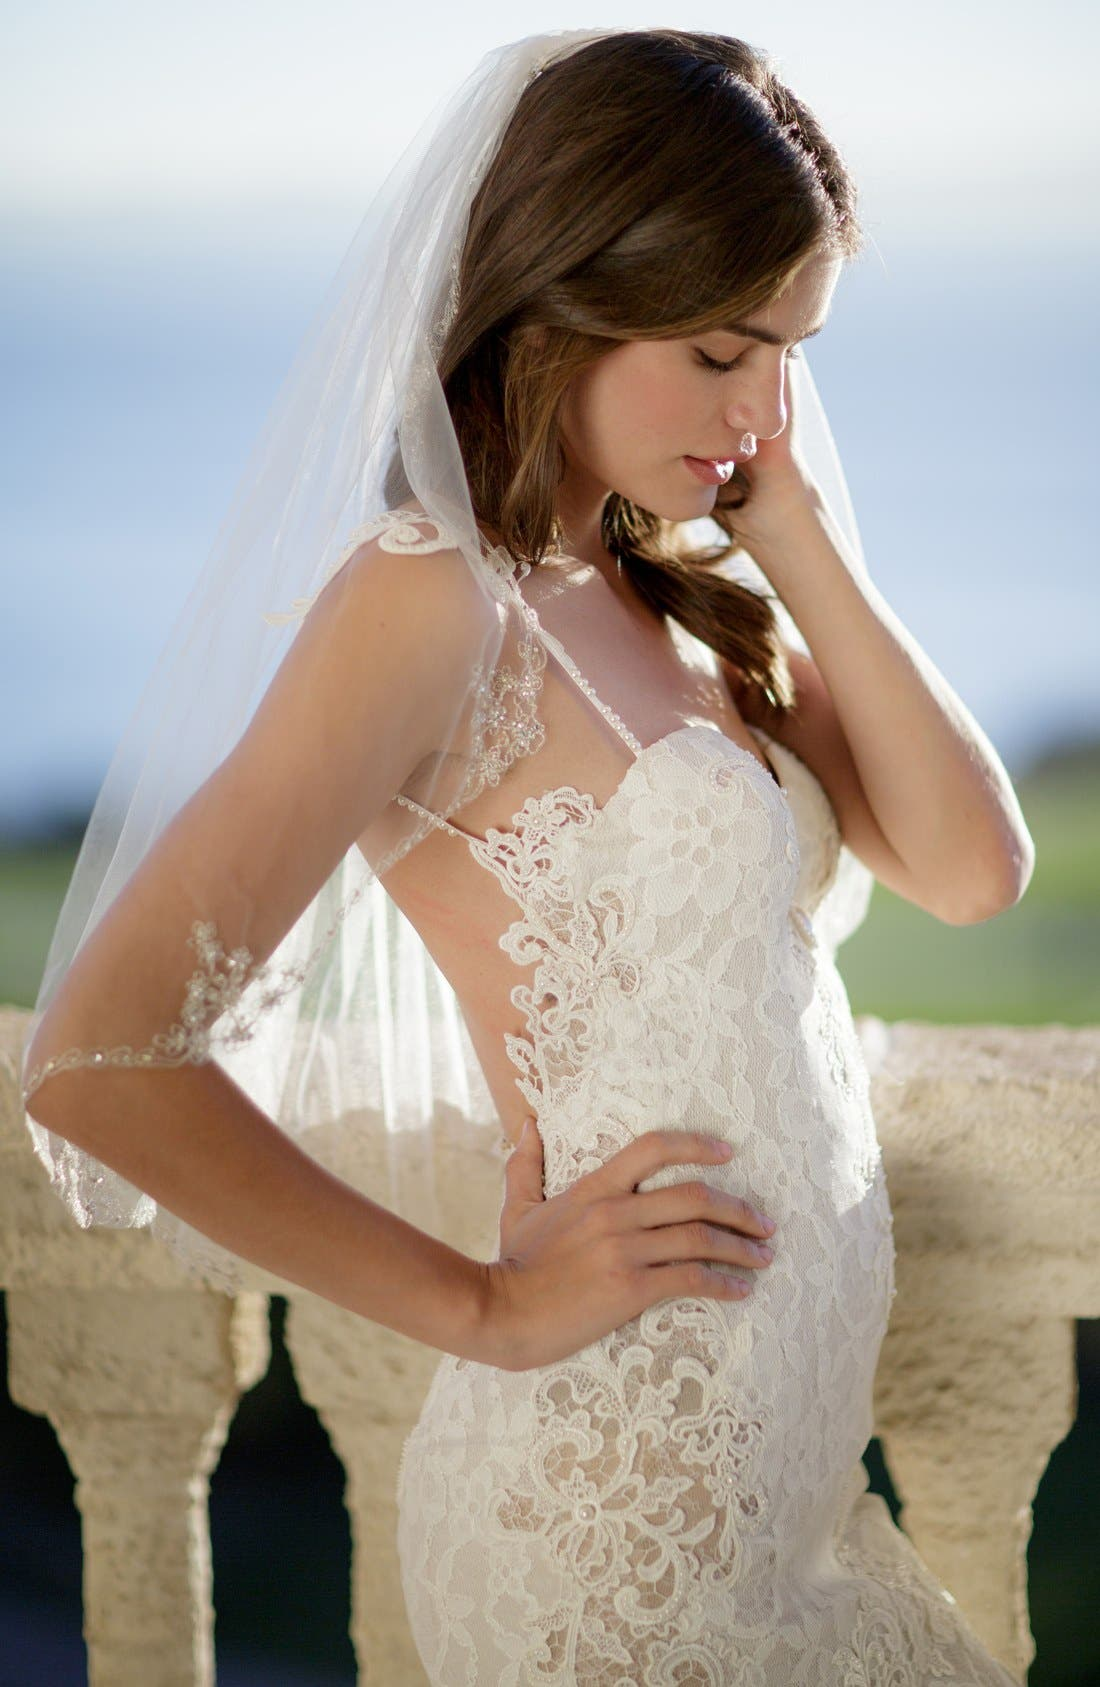 Main Image - Brides & Hairpins 'Sophie' Embellished Tulle Veil